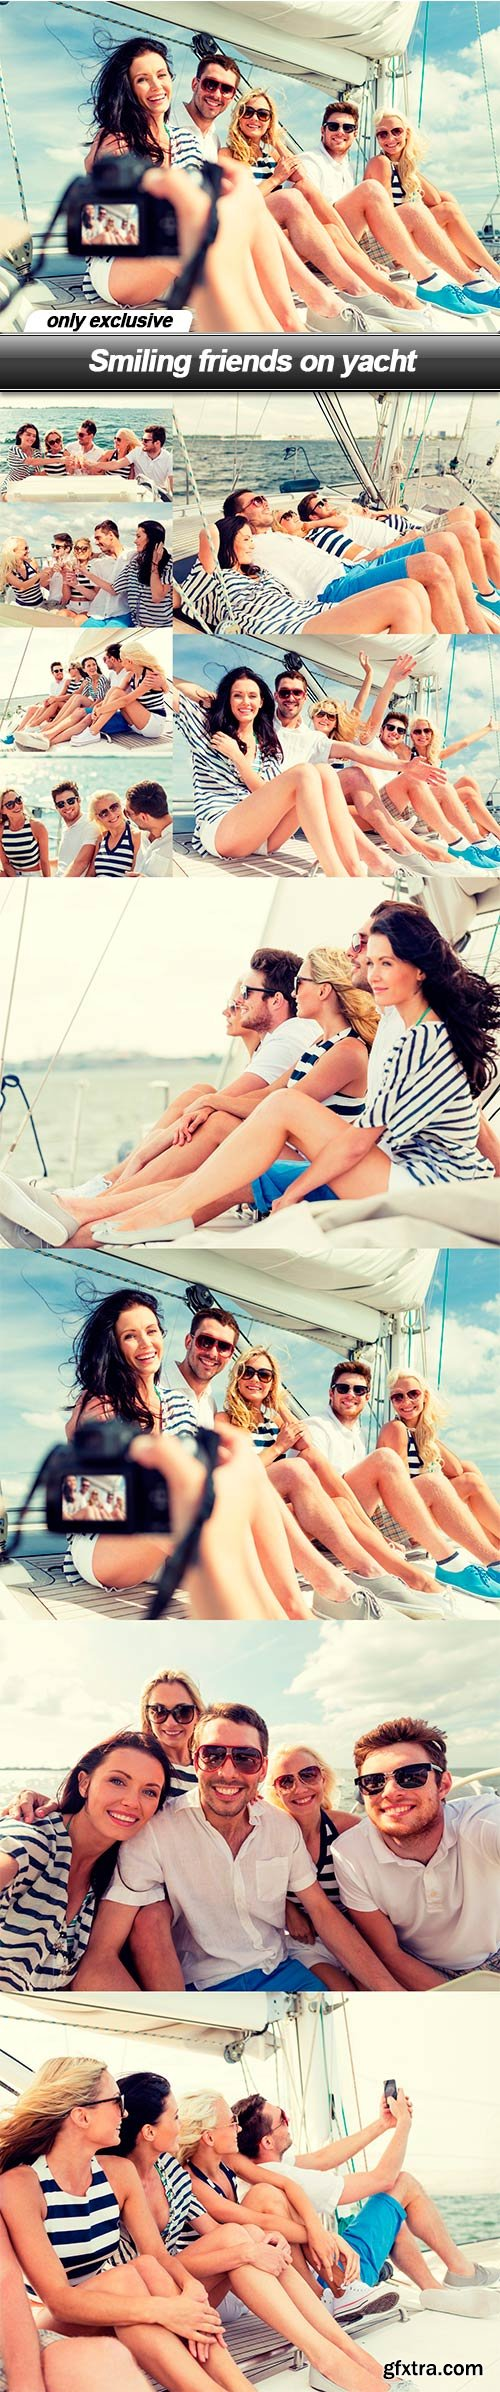 Smiling friends on yacht - 10 UHQ JPEG